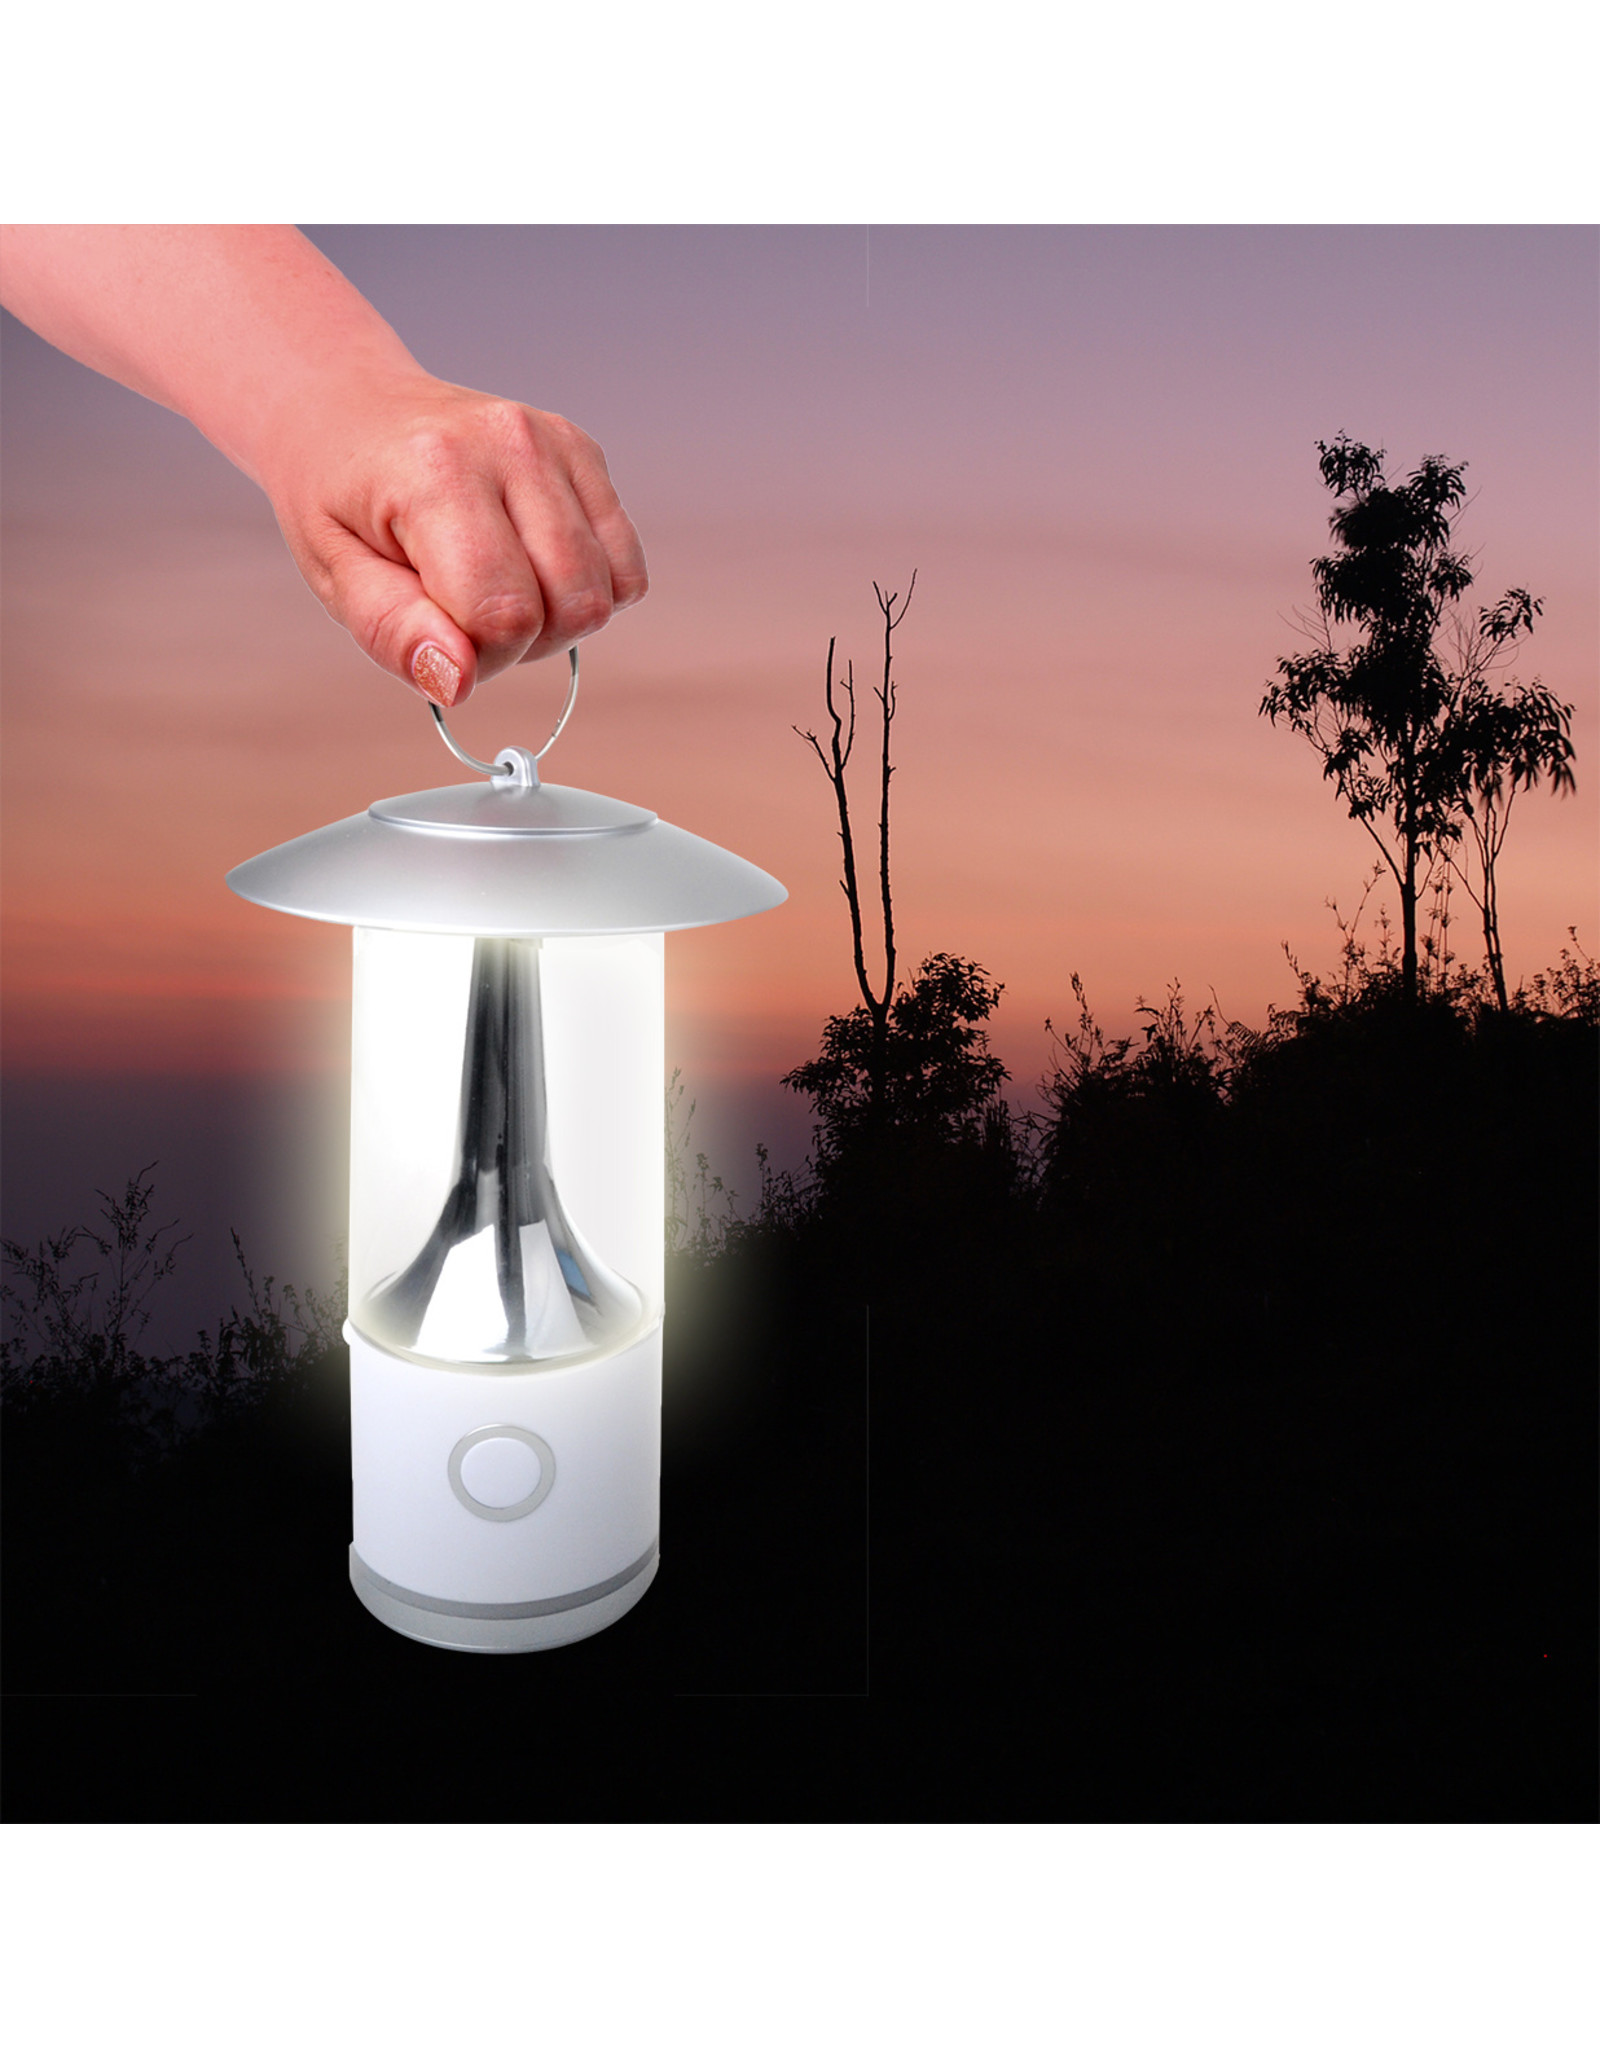 Campinglamp 16leds dimbaar en oplaadbaar